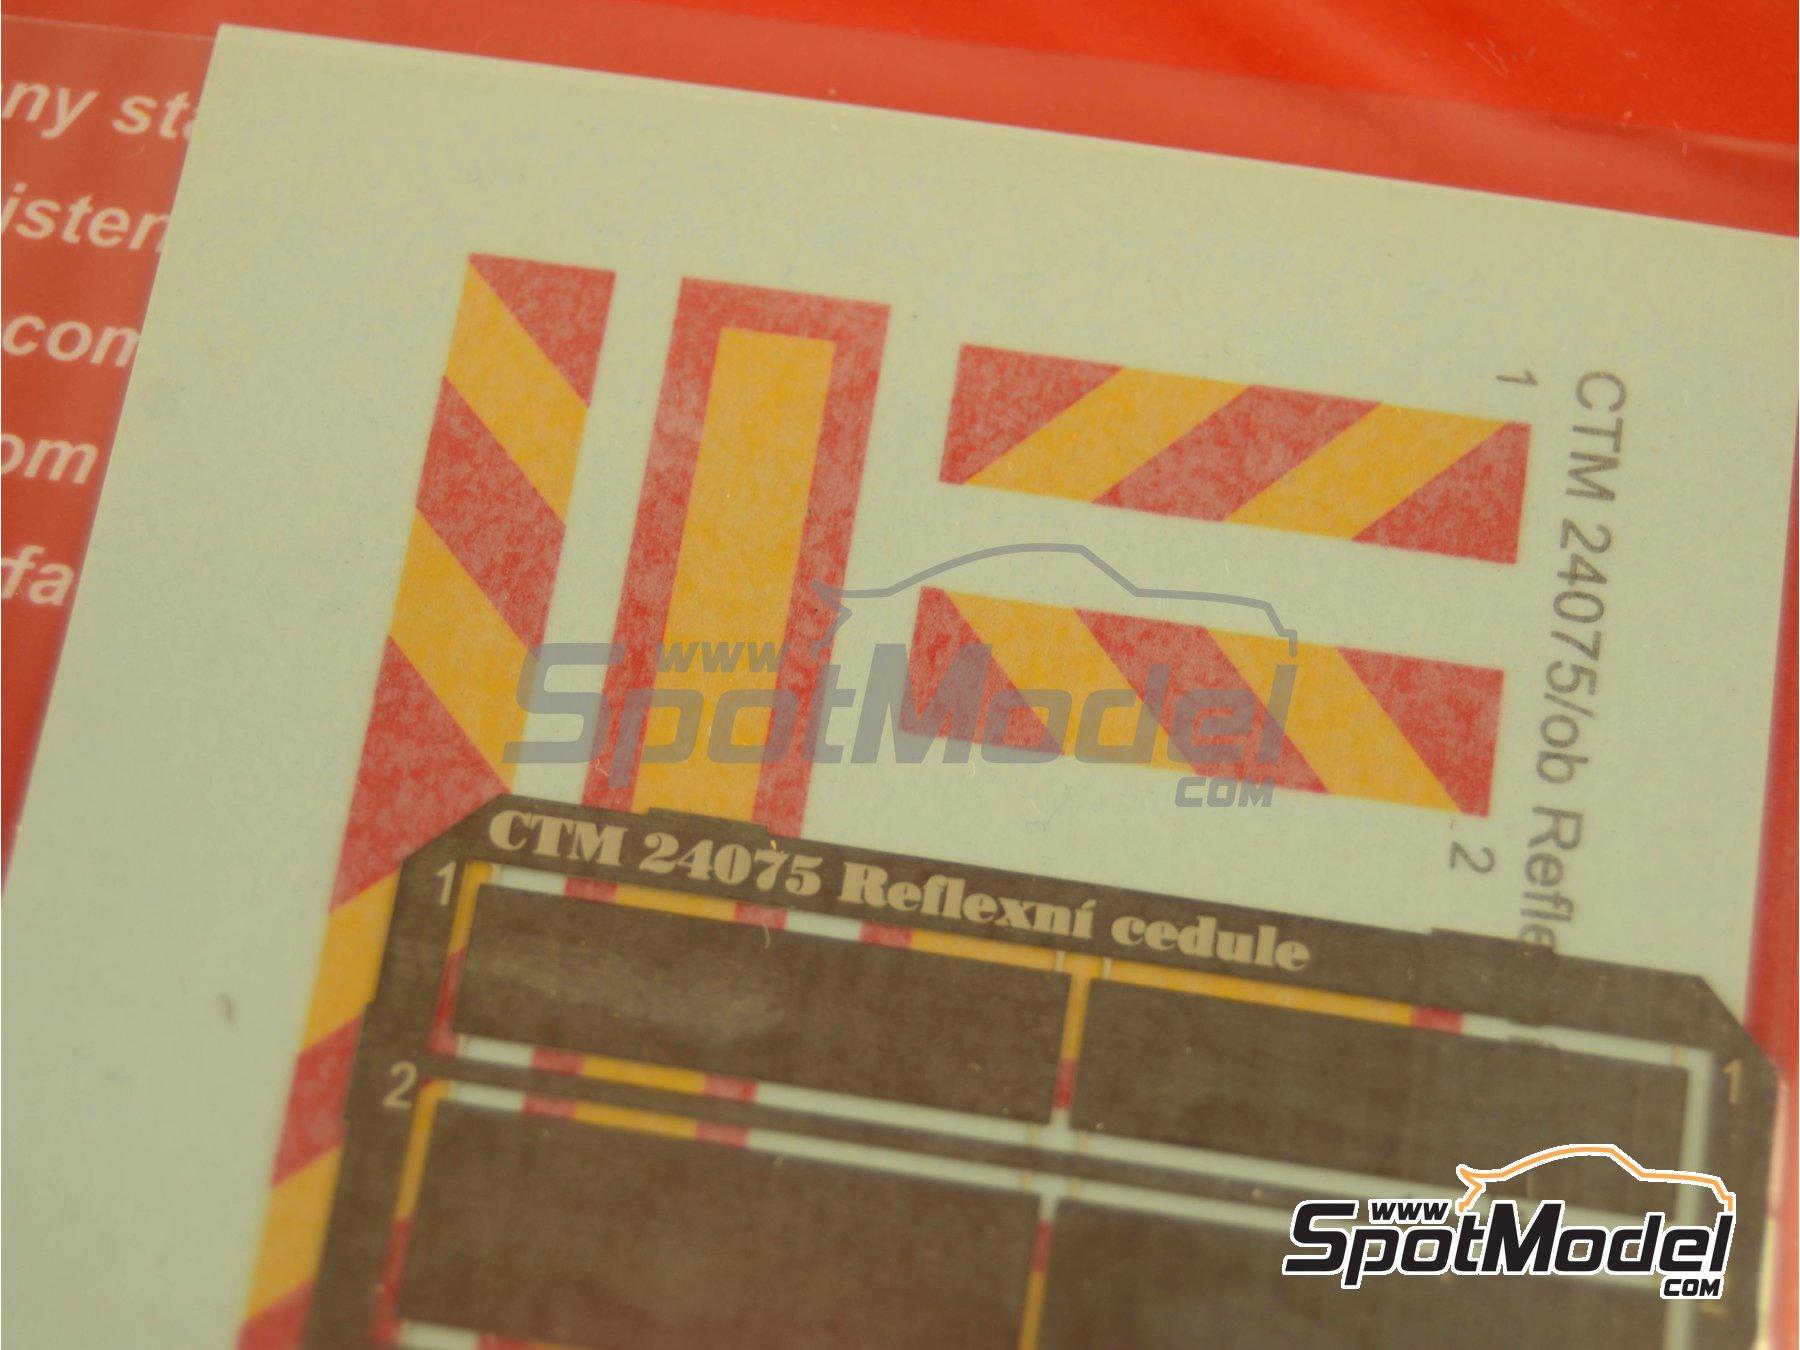 Image 1: Placas reflectantes traseras tipo ECE R 70 | Mejora en escala1/24 fabricado por Czech Truck Model (ref.CTM24075)